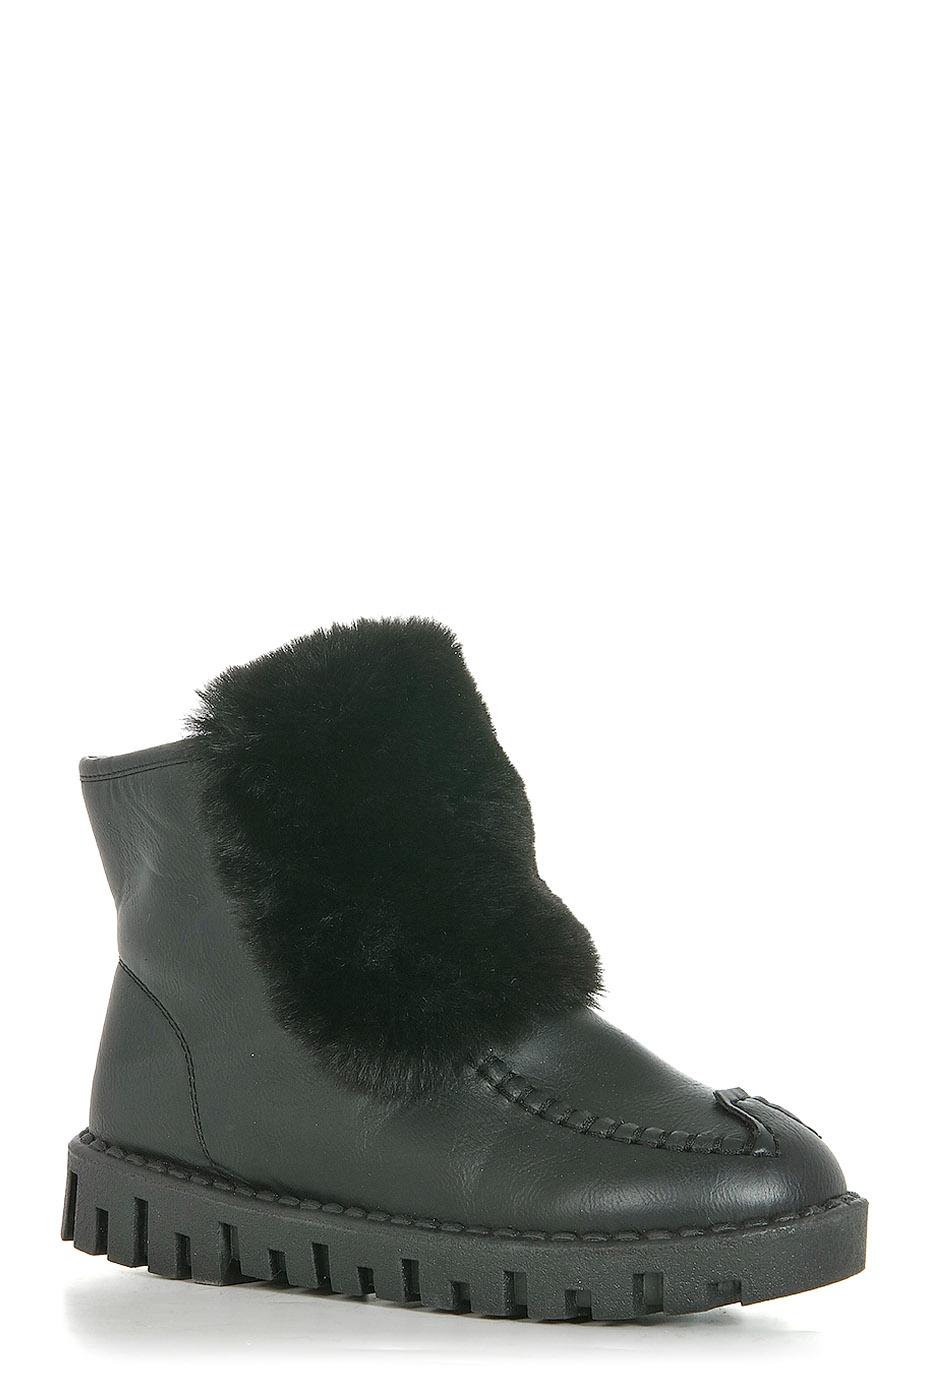 Ботинки TOPLAND2322-PB76269B/BLACK